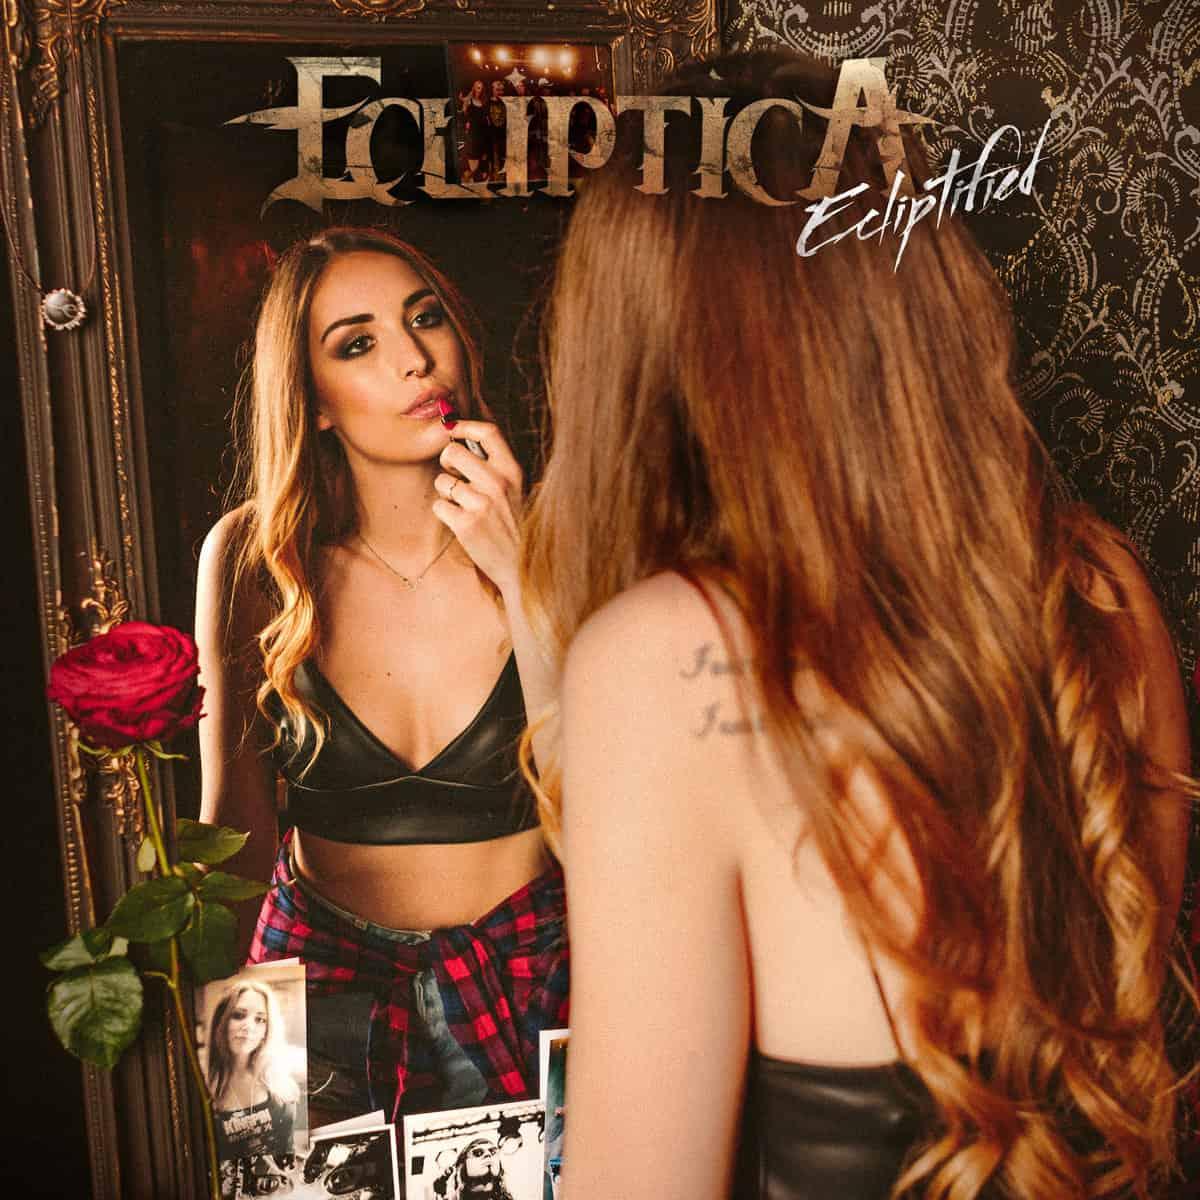 Ecliptica Eclipitfied